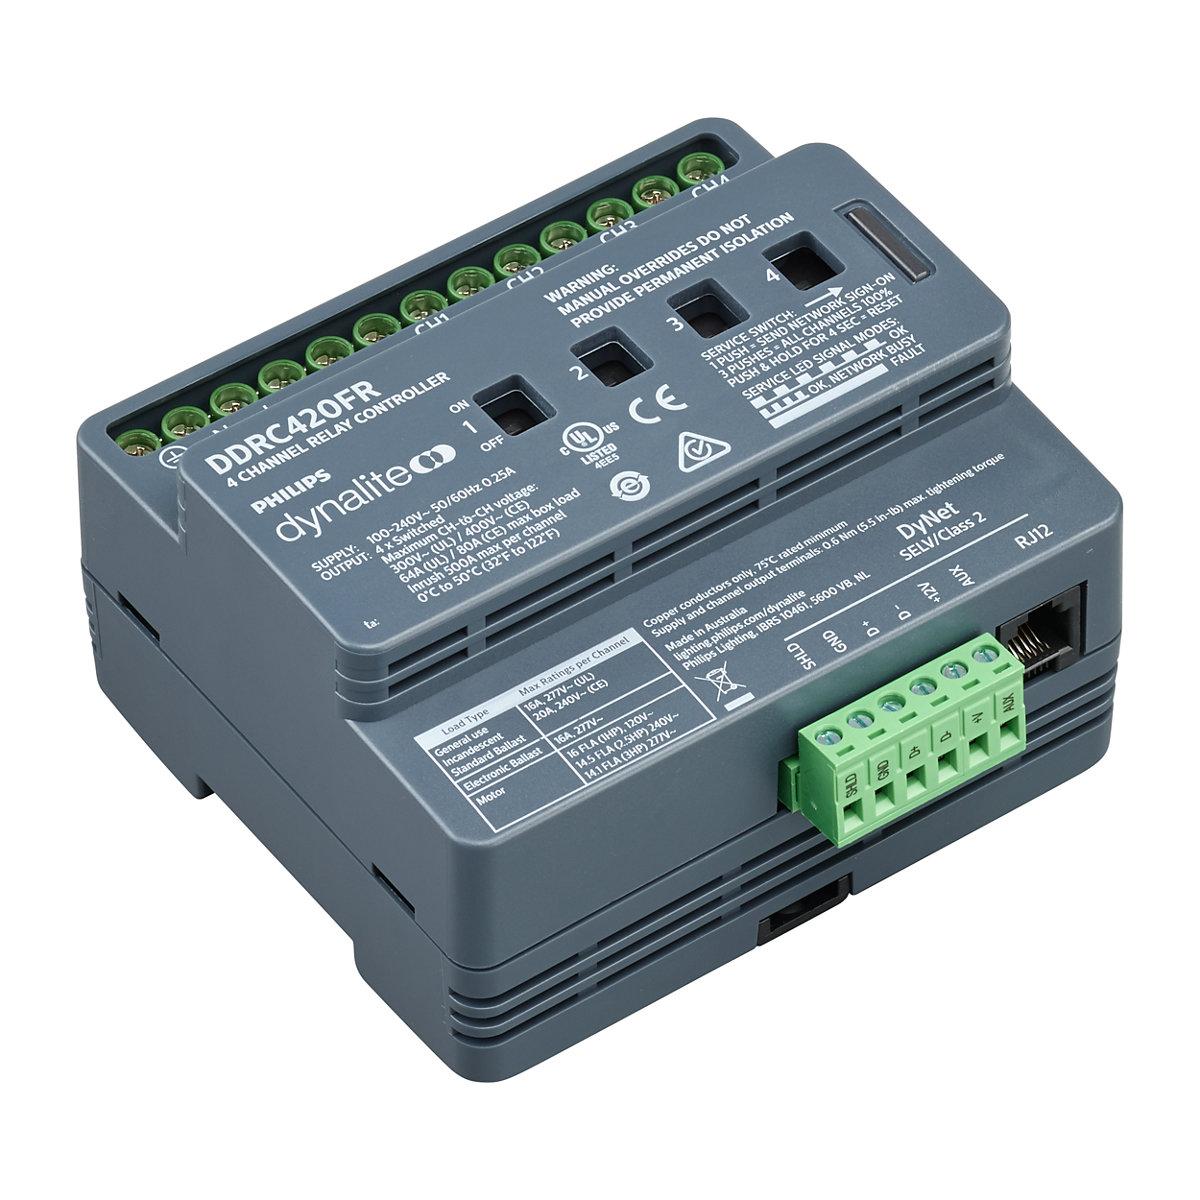 DDRC420FR V1 Dynalite Relay Controllers